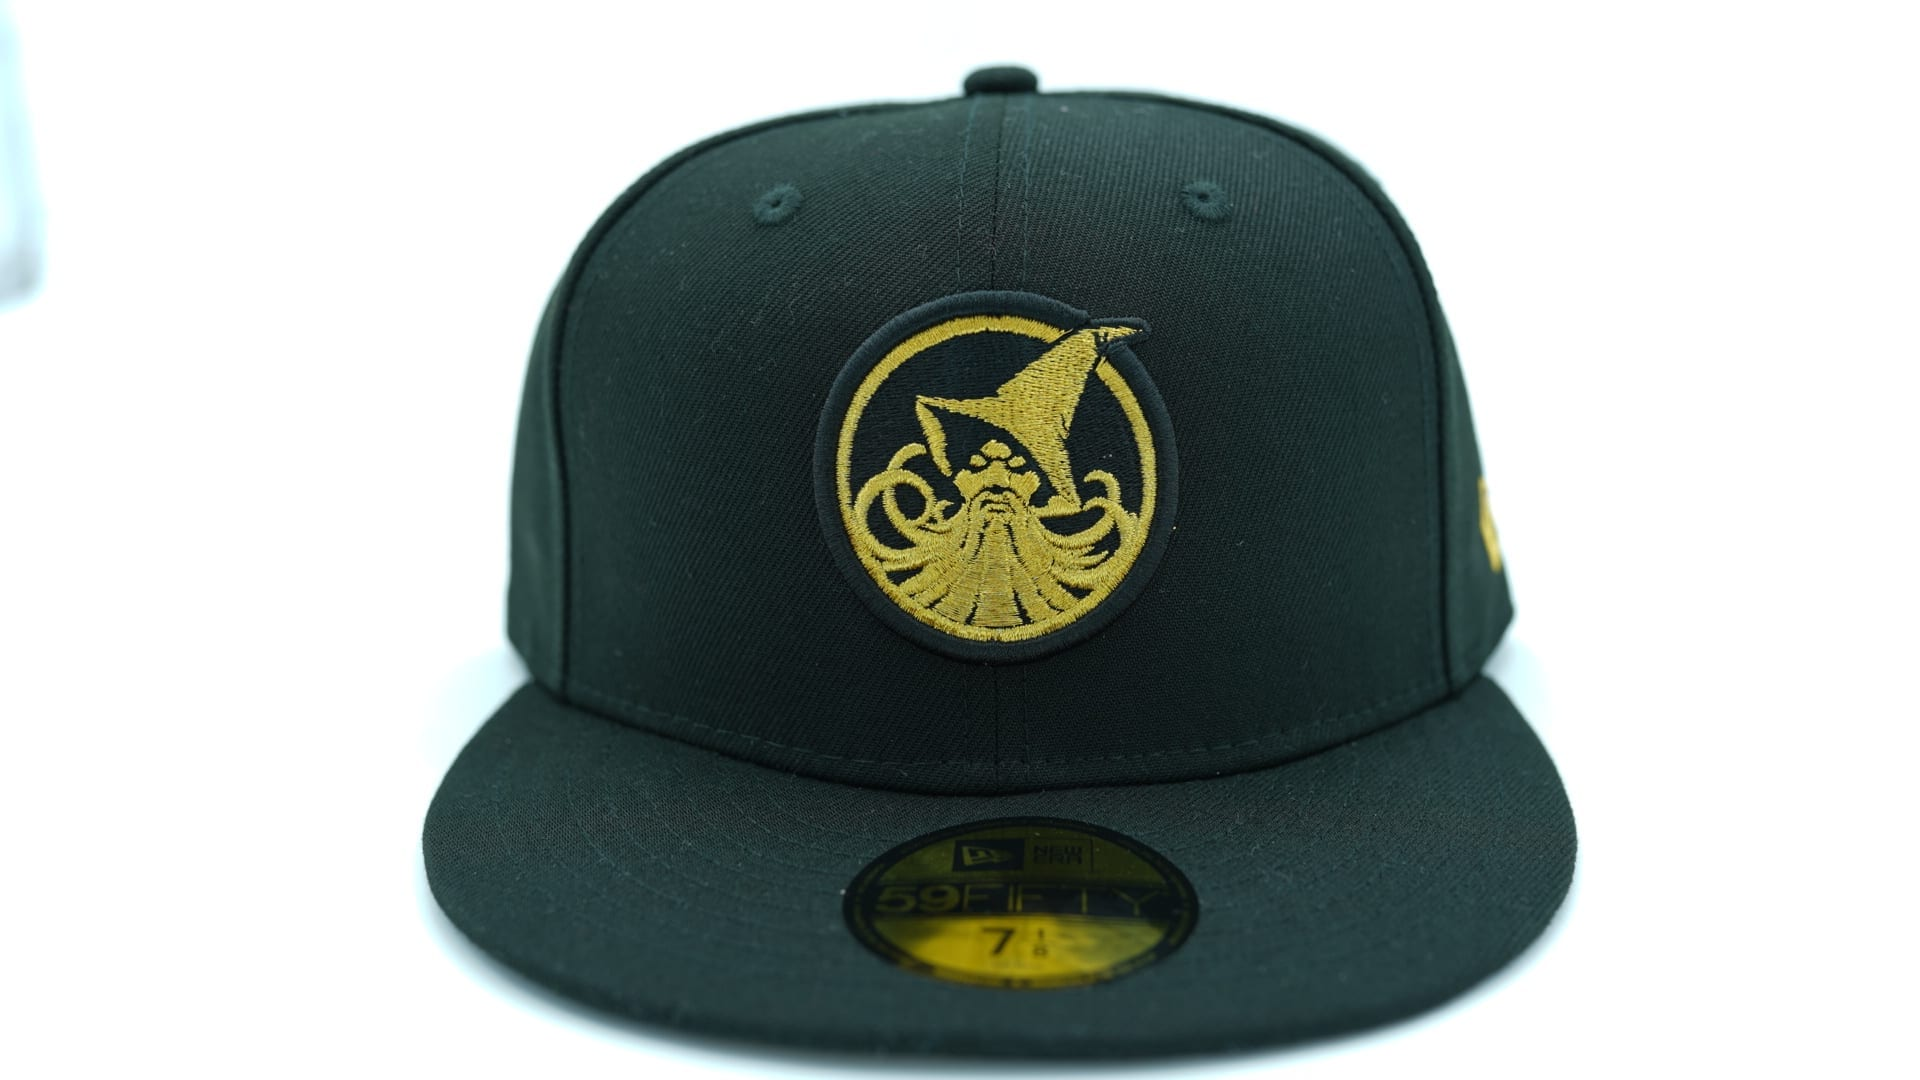 ... new zealand hat mlb tumblr final round rockstar 59fifty fitted baseball cap  rockstar energy new era ... b0686a88950